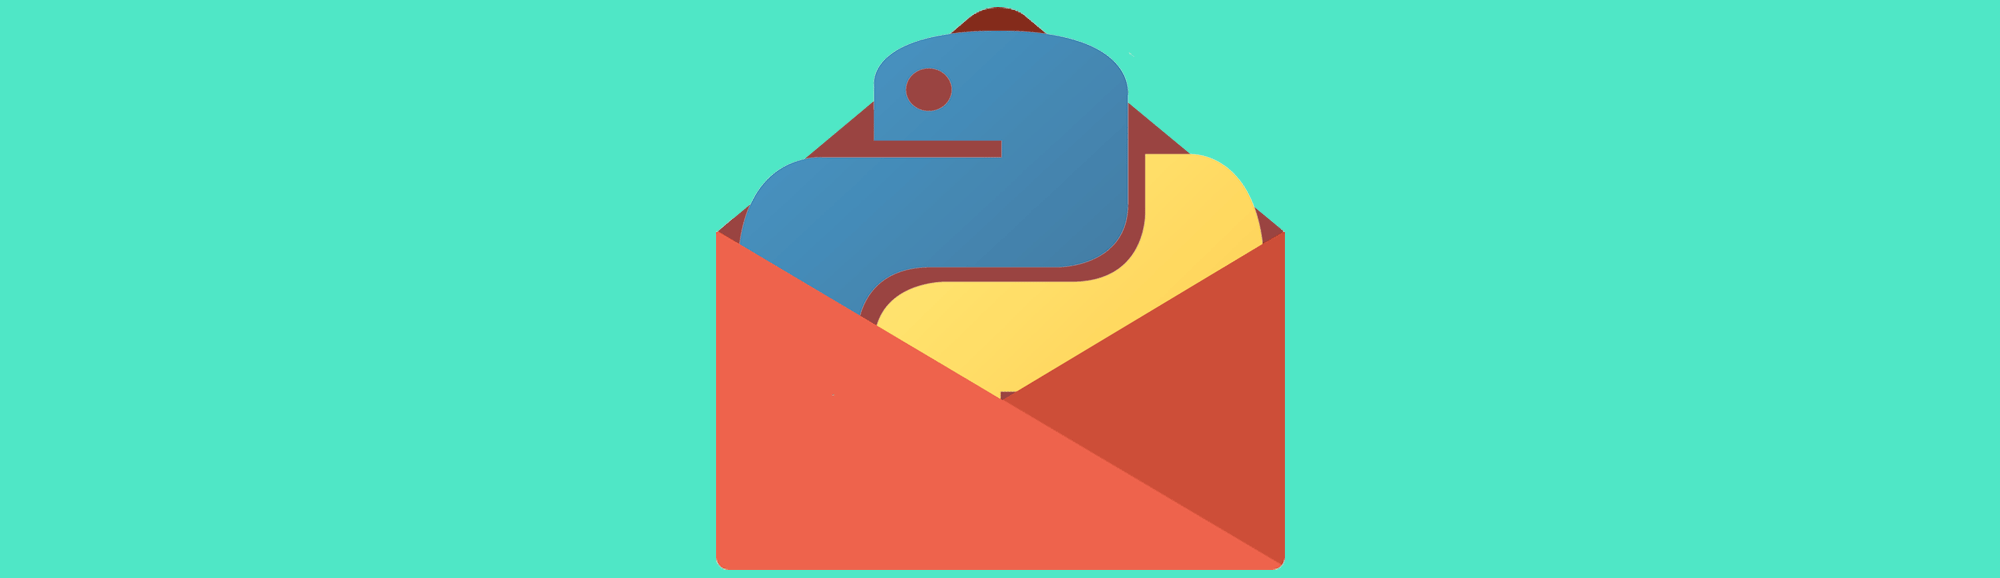 Python encrypting